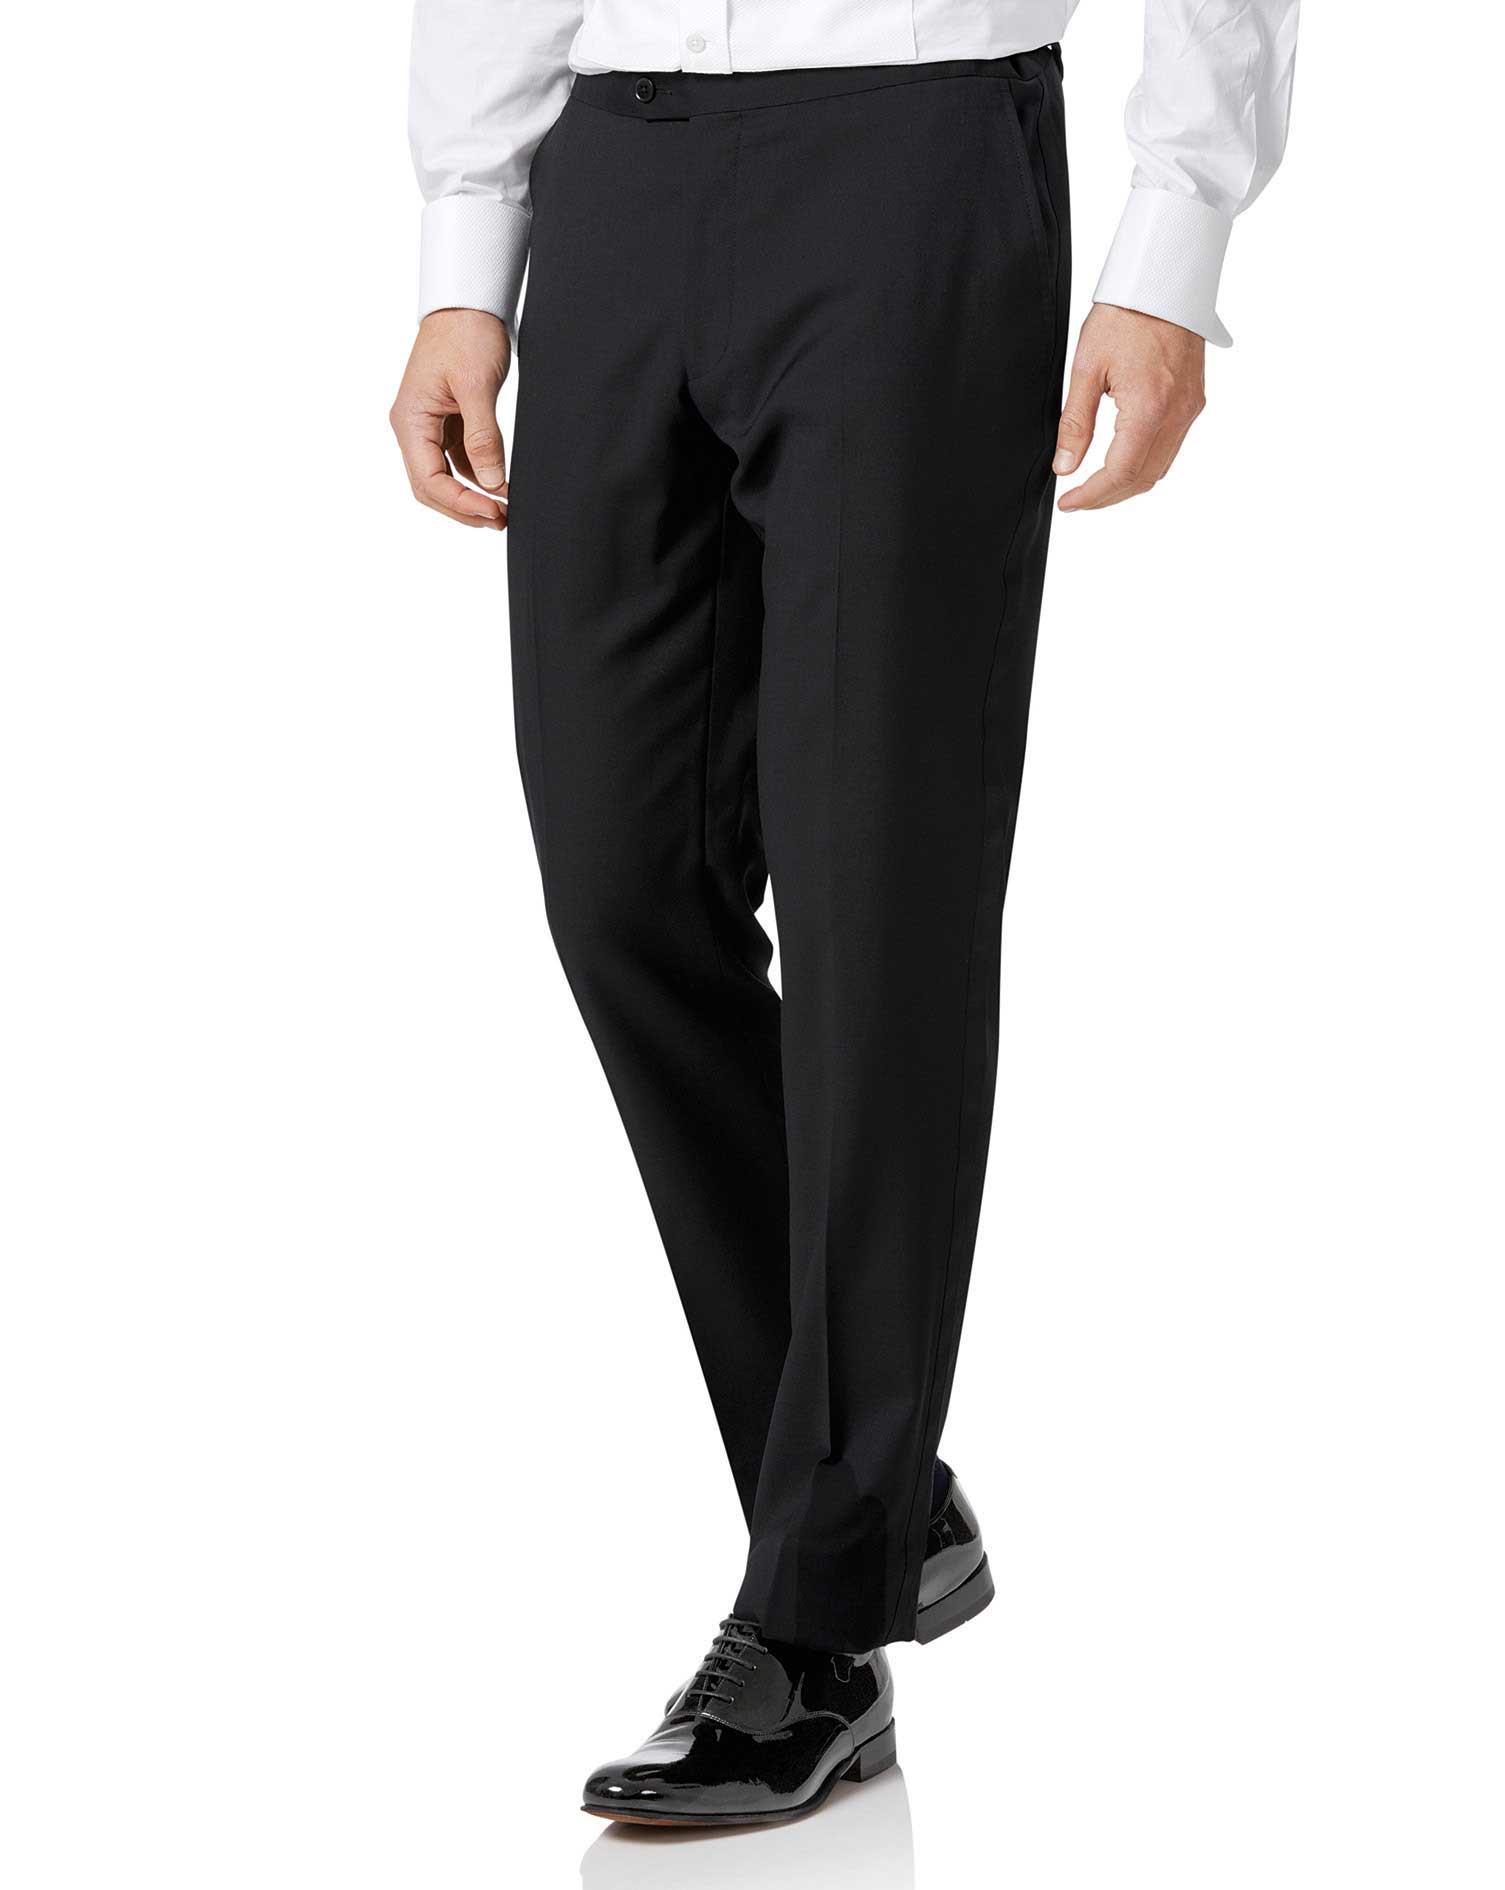 Black Slim Fit Dinner Trousers Size W32 L34 by Charles Tyrwhitt